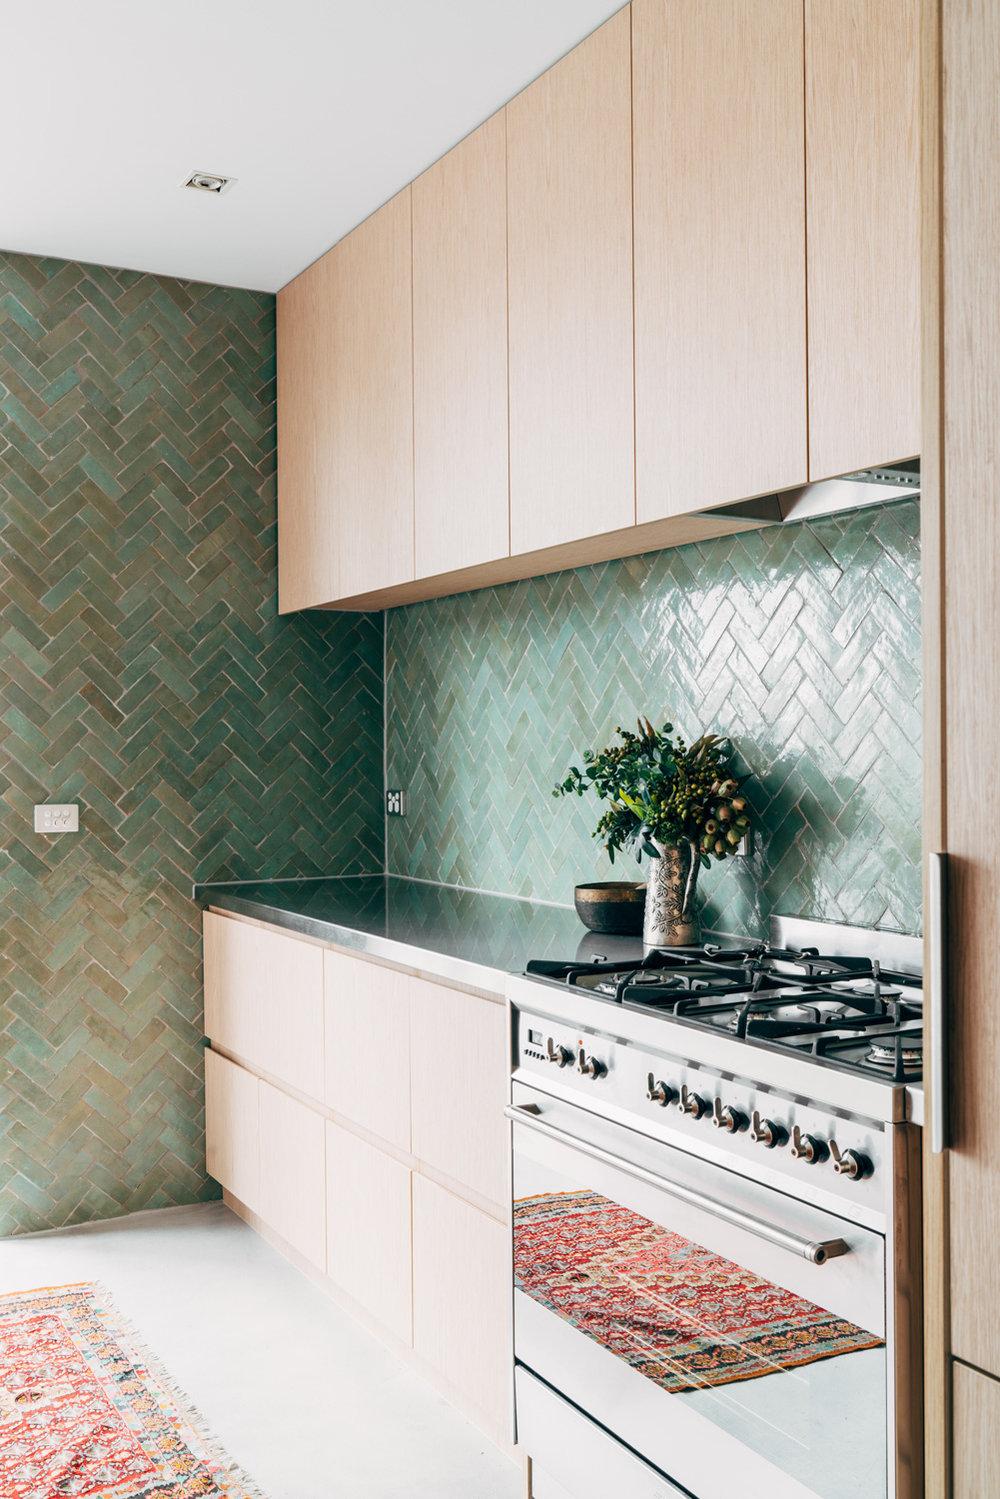 Richmond Residence Interior Design -  Studio Ezra  Tiles - Tiles of Ezra FL006 Aqua  (shop now)